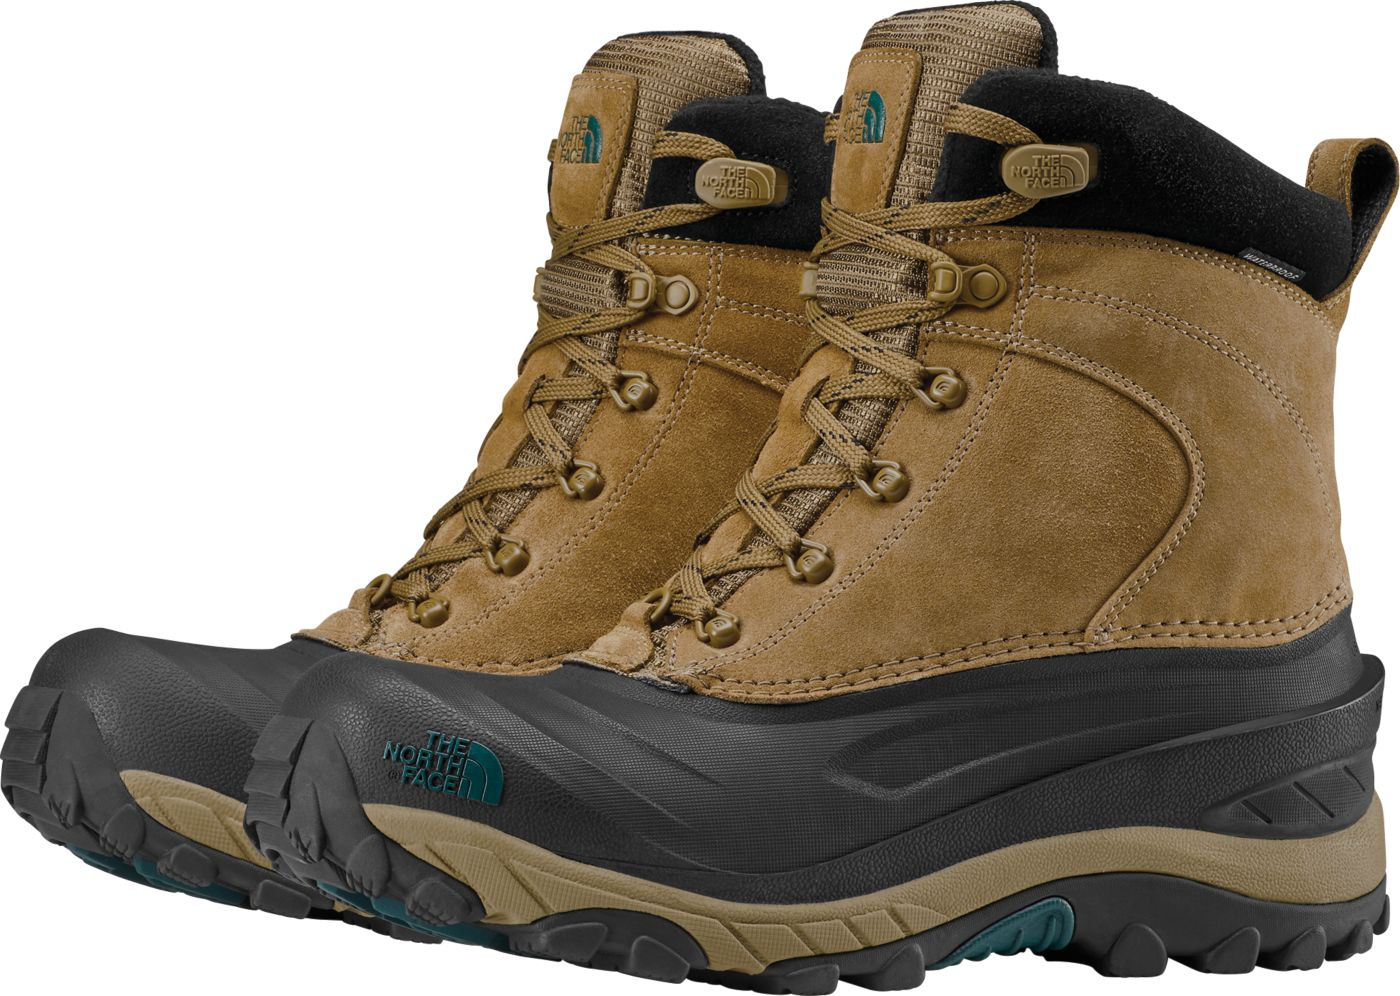 The North Face Men's Chilkat III 200g Waterproof Winter Boots